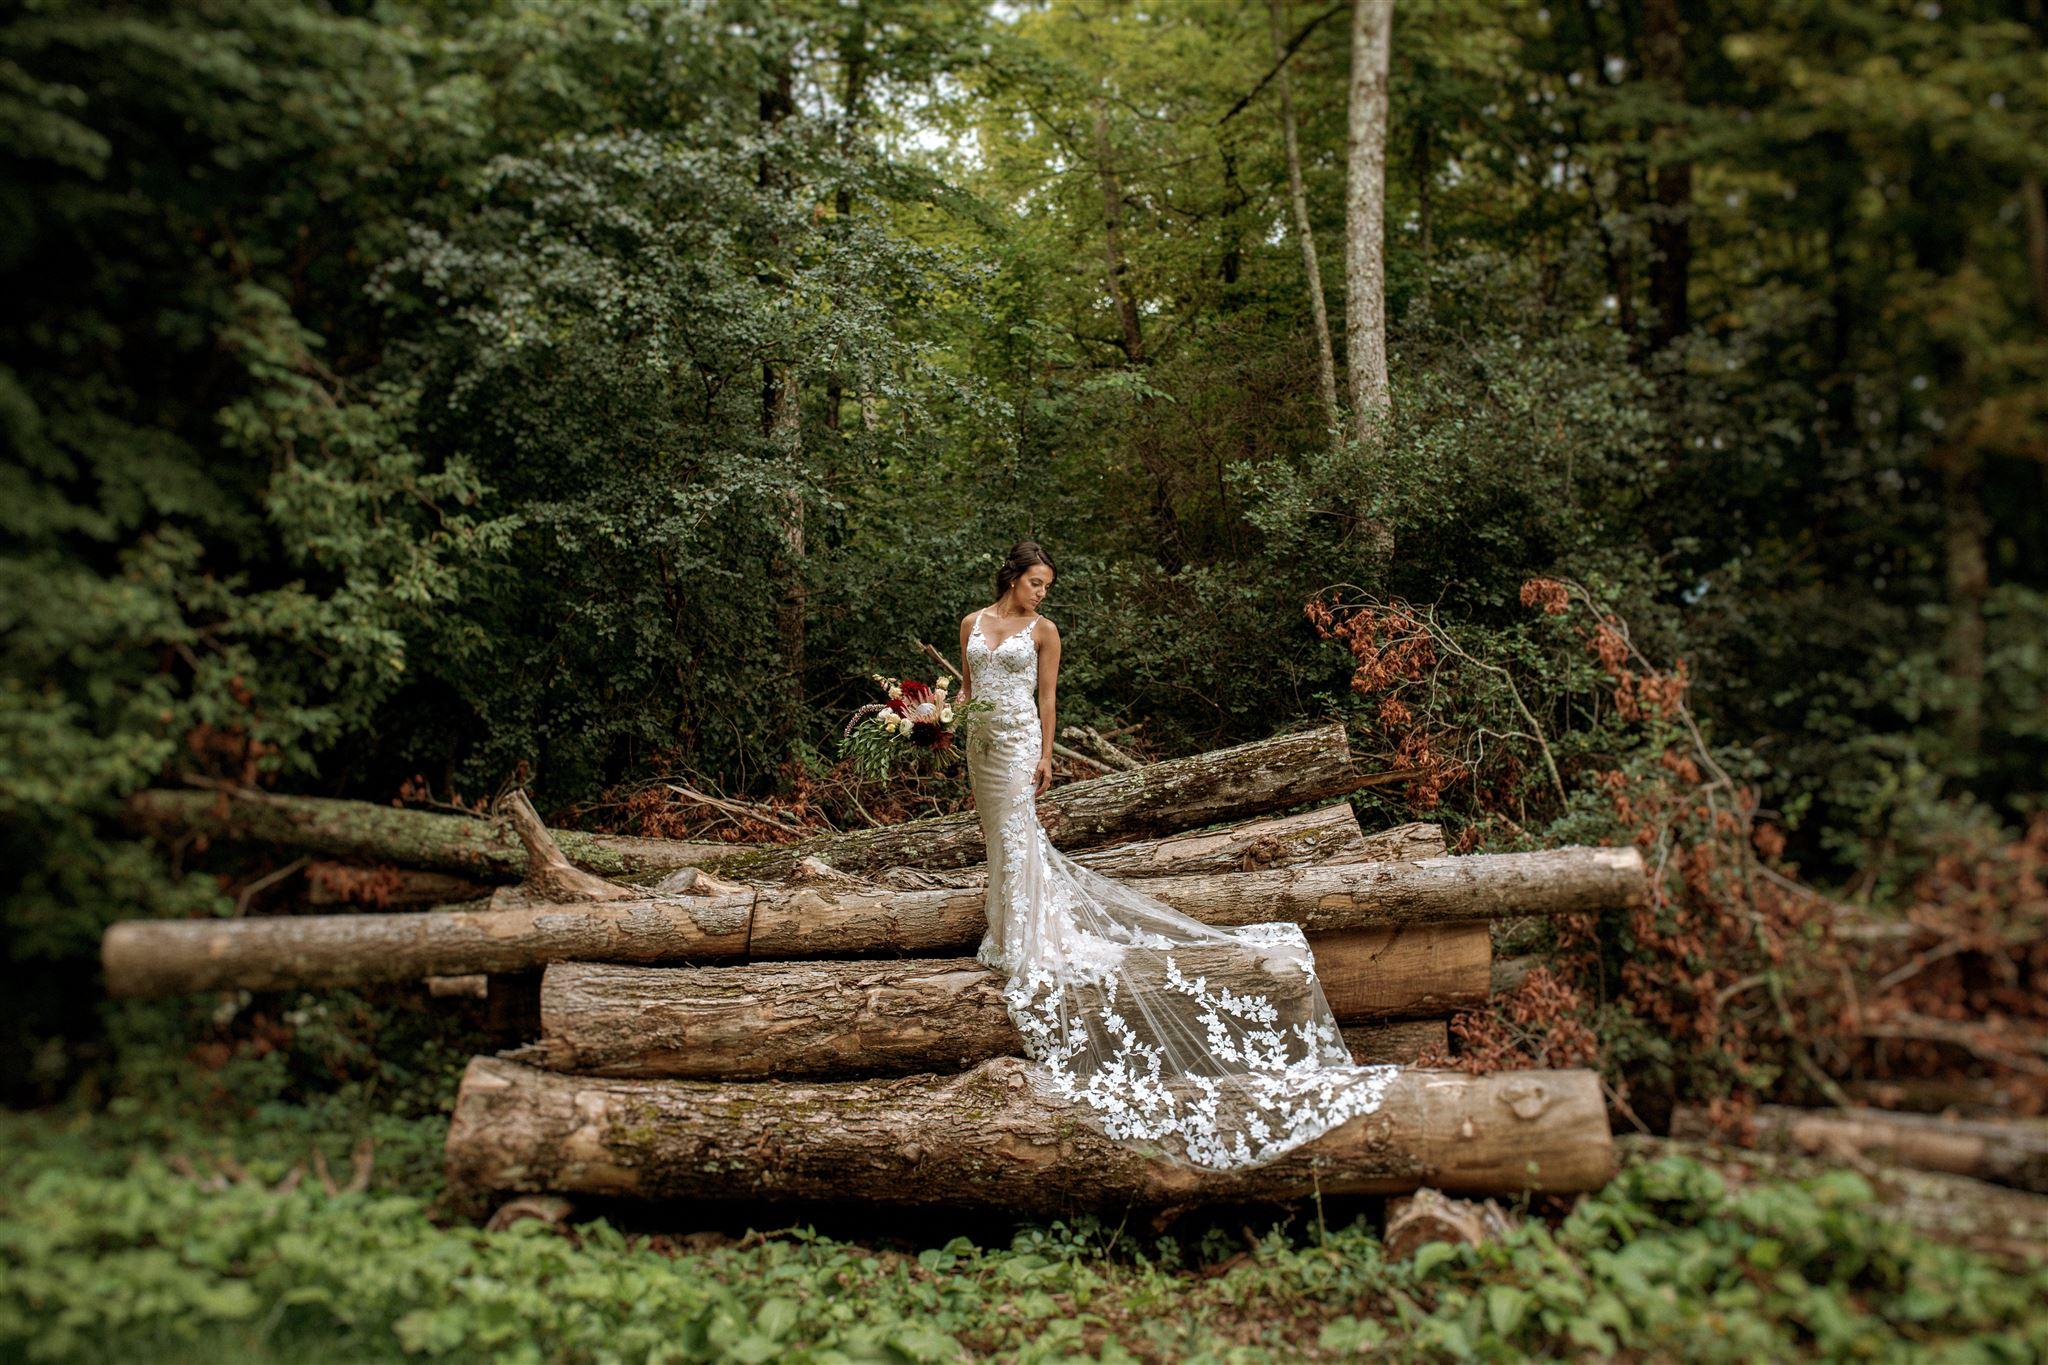 jose melgarejo brooklyn wedding photographer reviews wendy